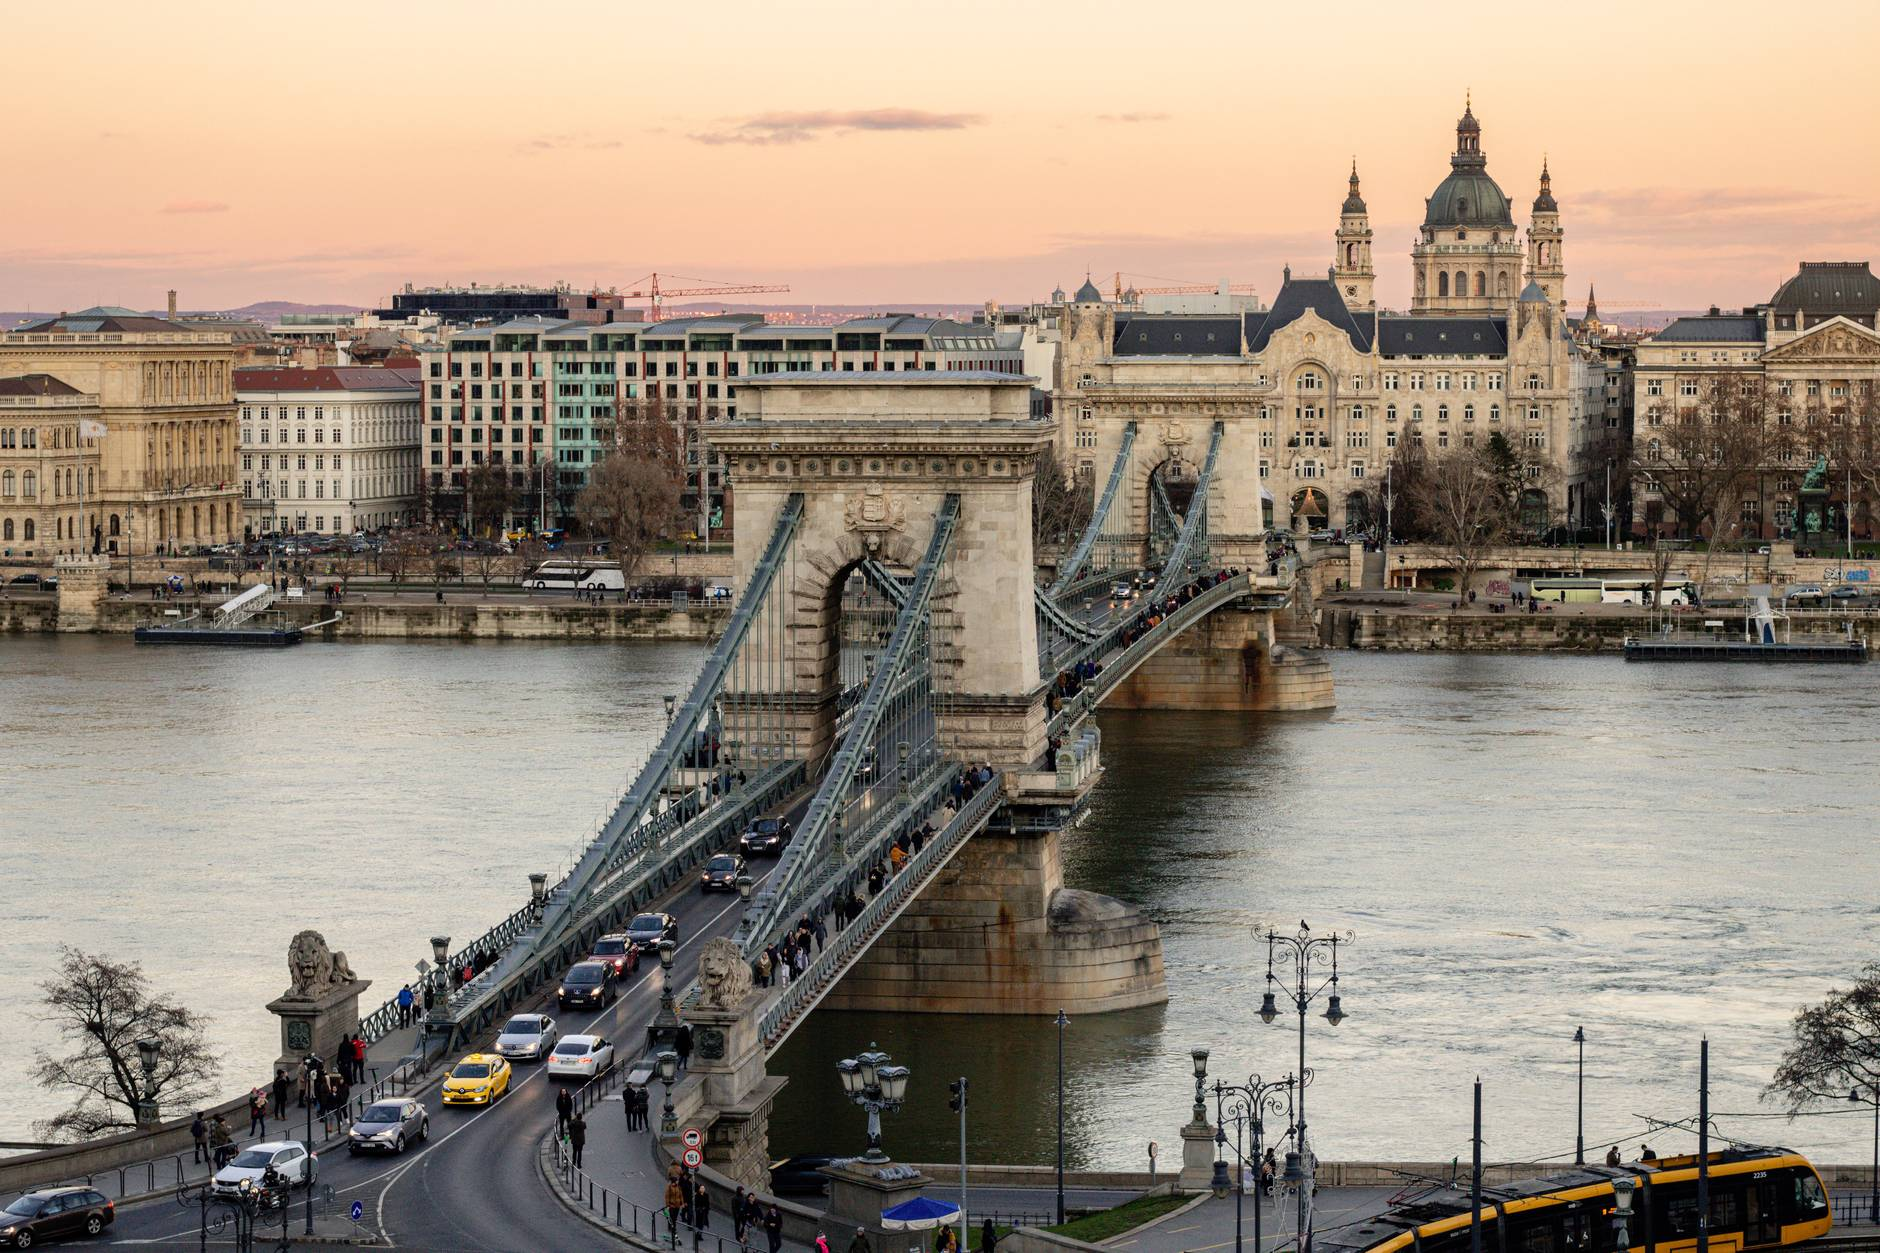 bridge over river near buildings